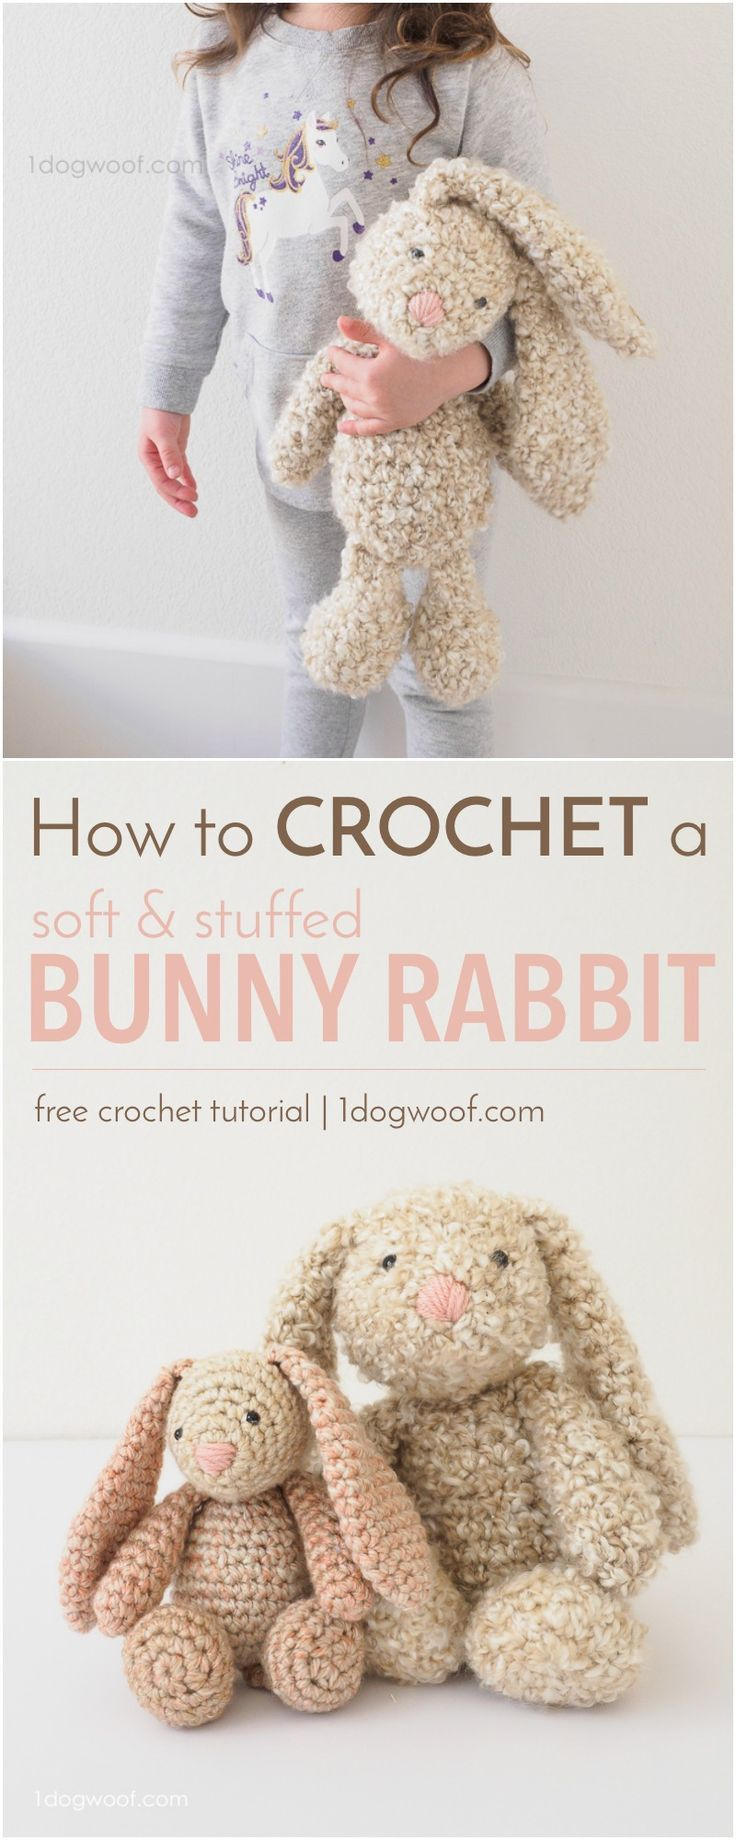 Classic Stuffed Bunny Crochet Pattern for Easter | Tejido, Ganchillo ...